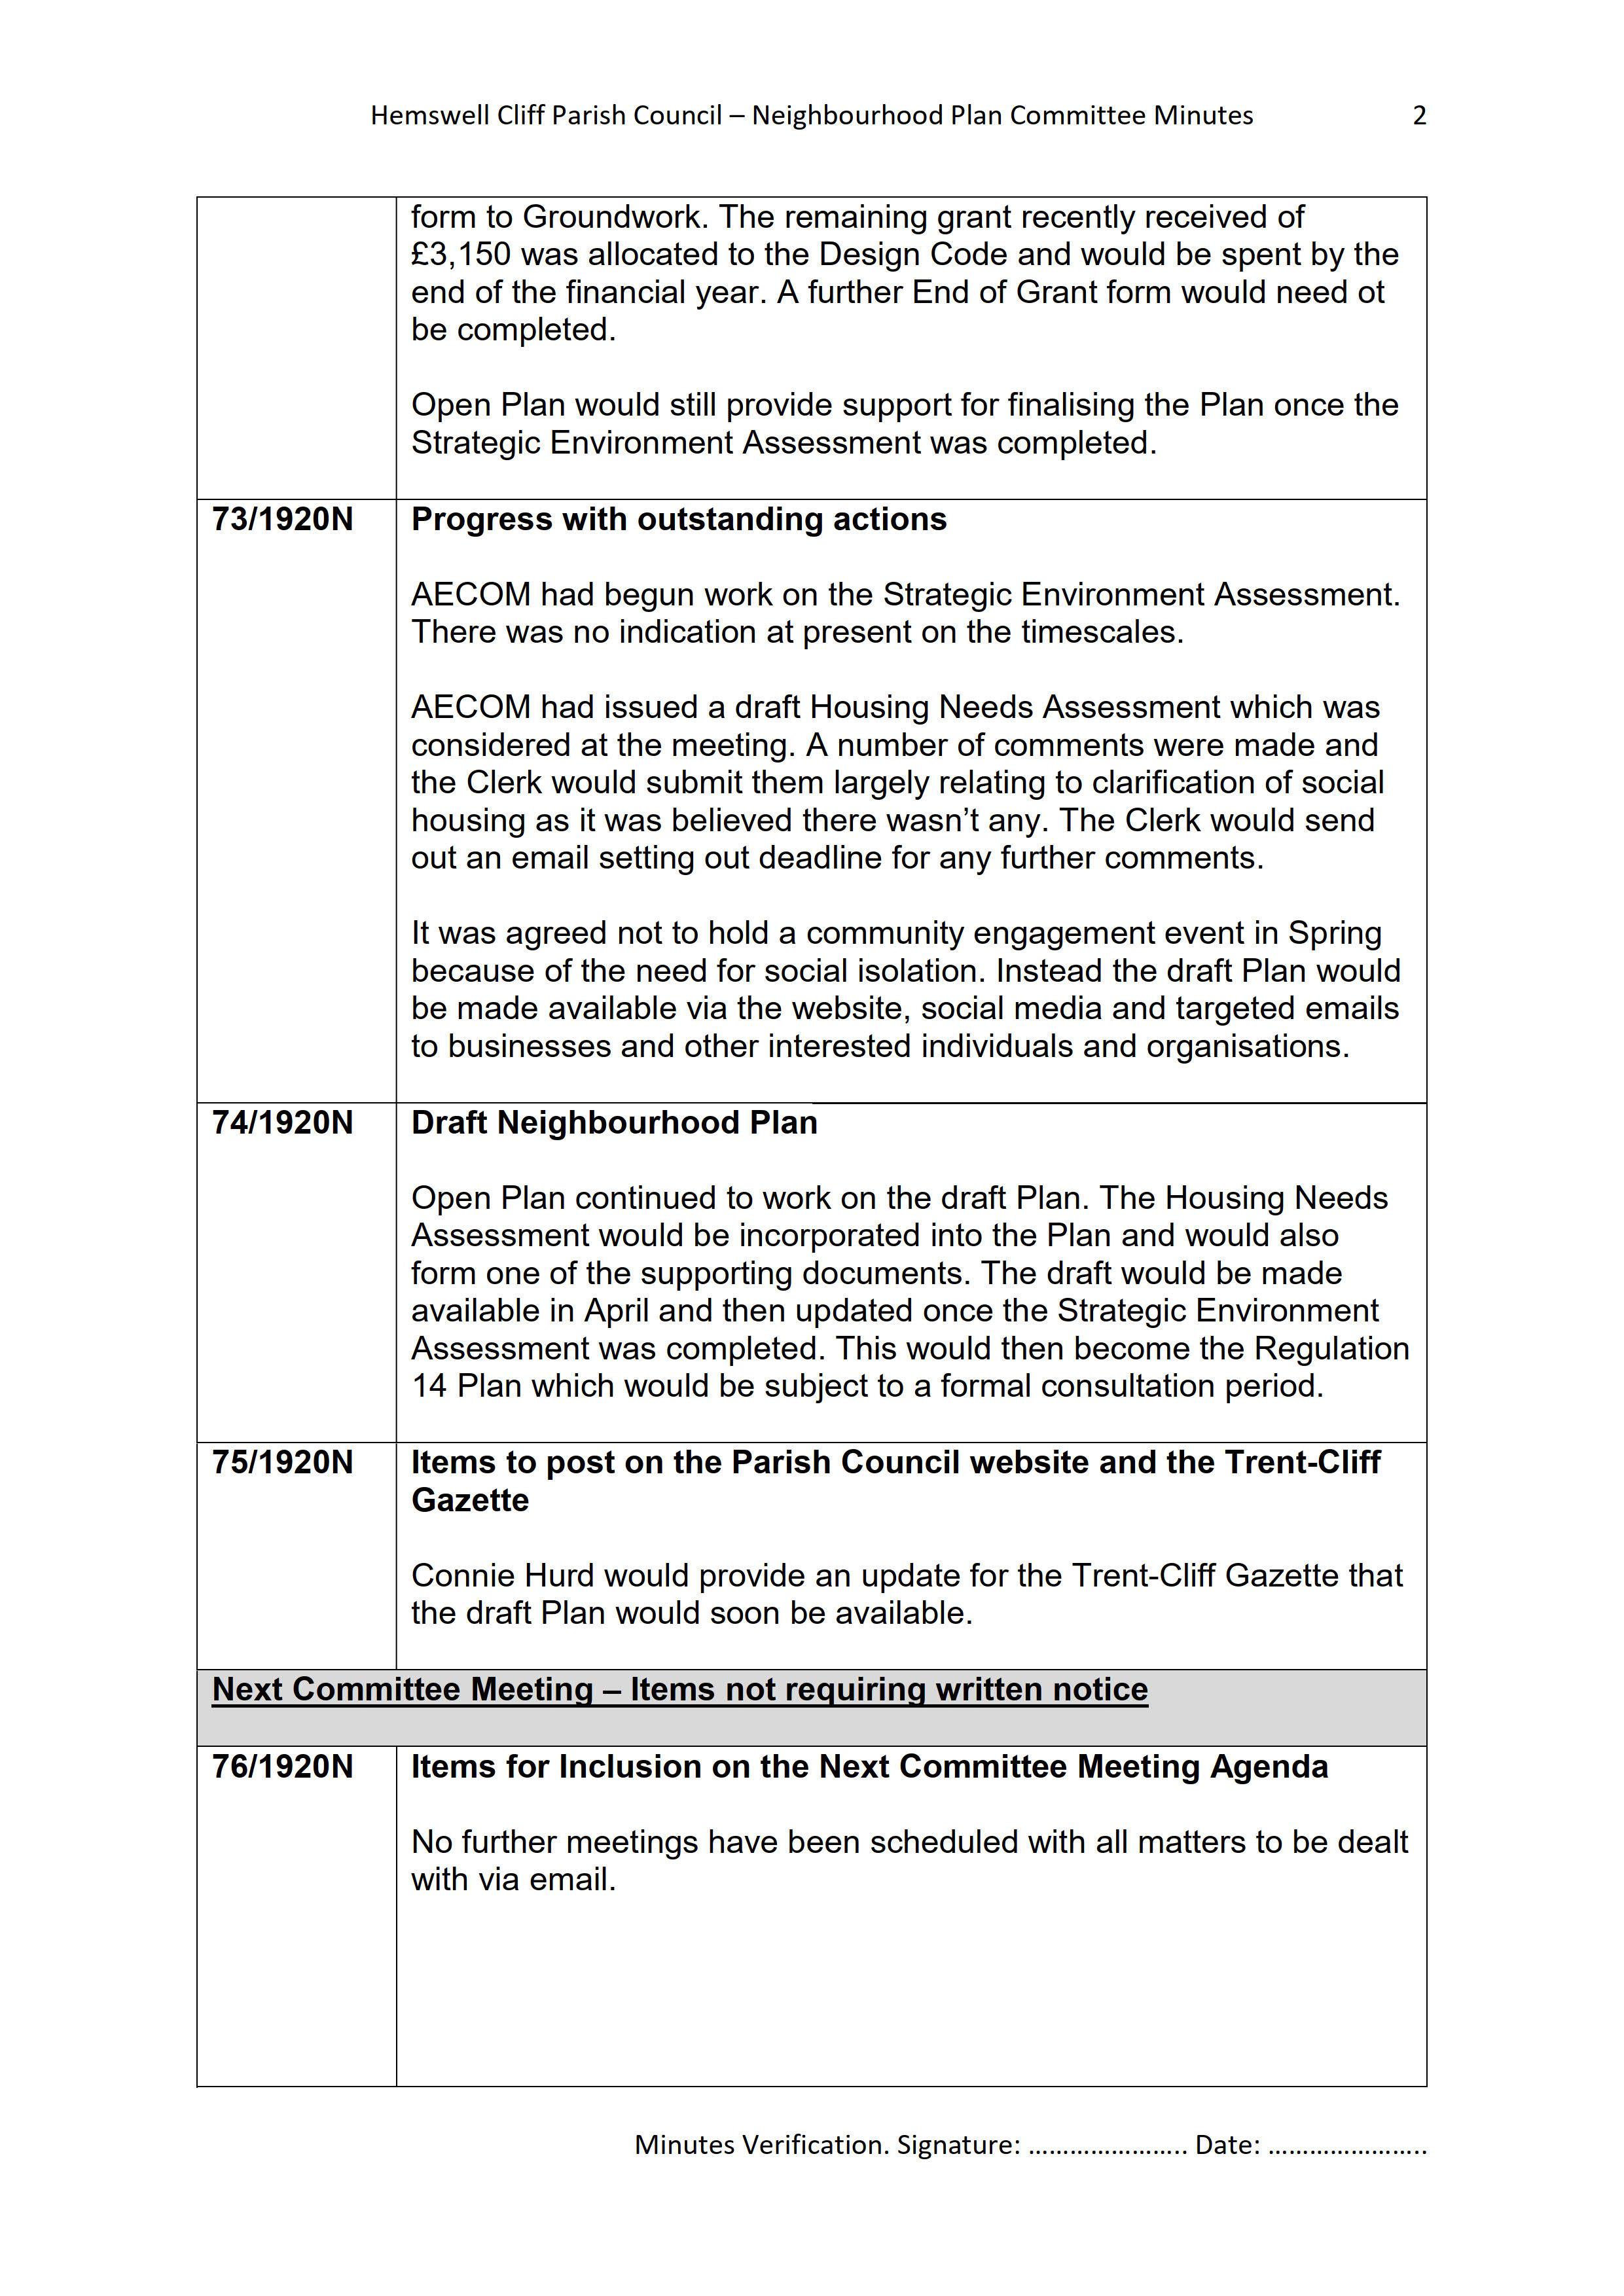 HCPC_NPC_Minutes_16.03.20_2.jpg